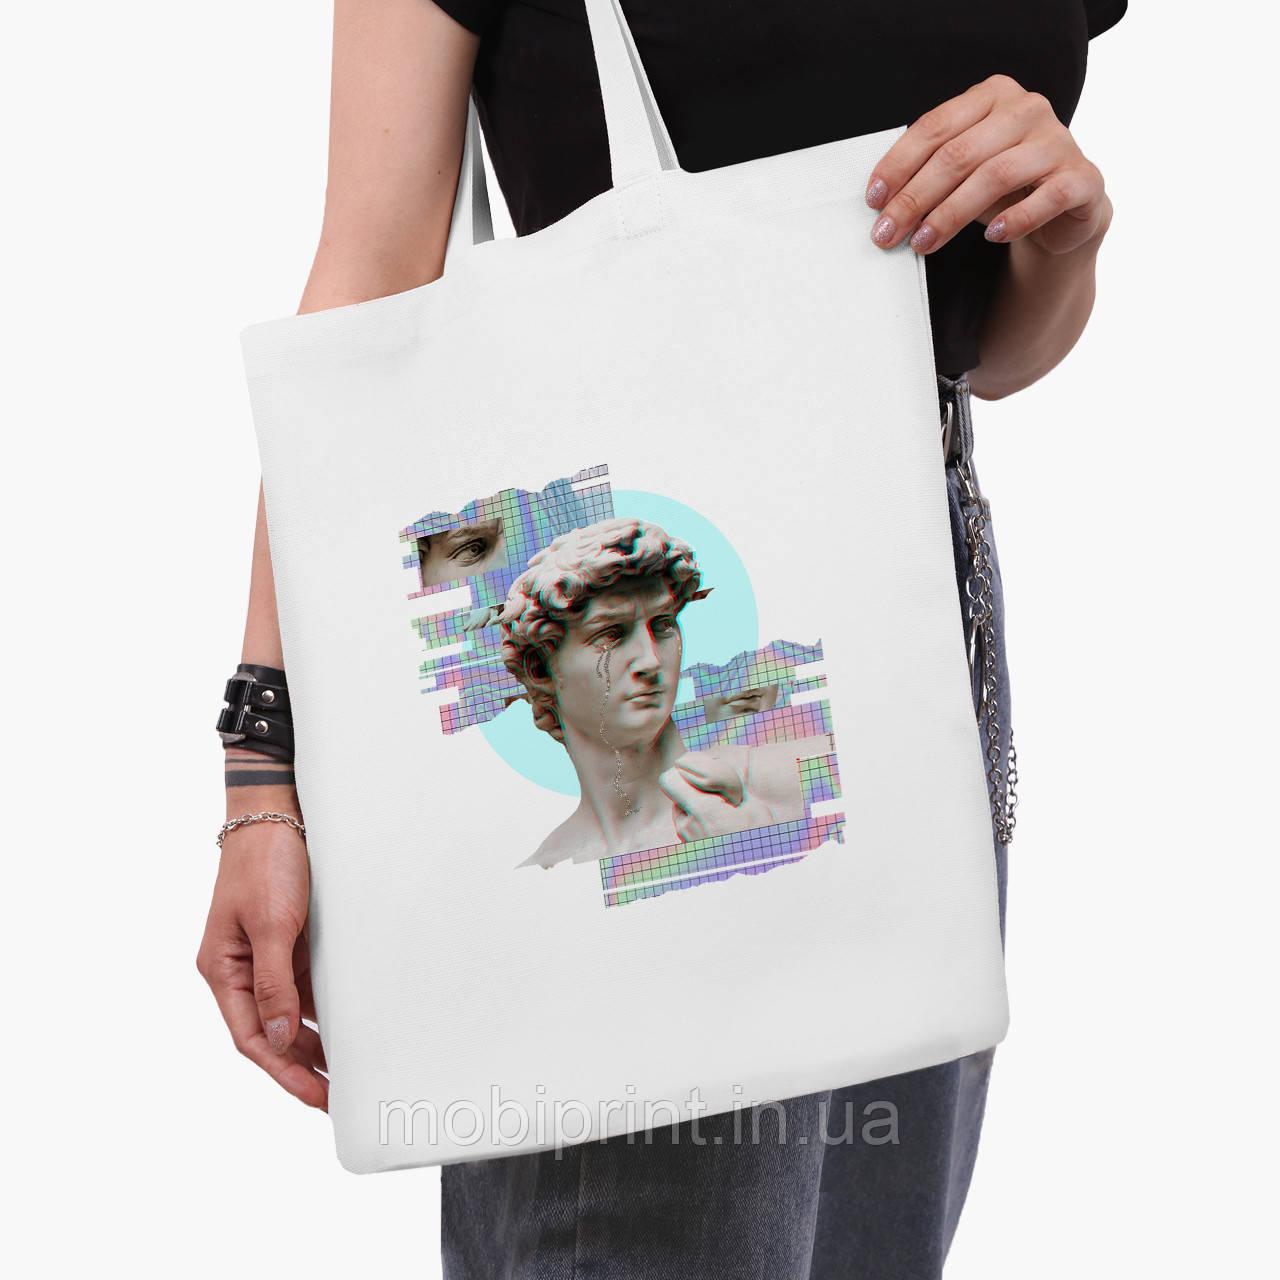 Эко сумка шоппер белая Ренессанс-Давил (David Renaissance) (9227-1584-3)  41*35 см